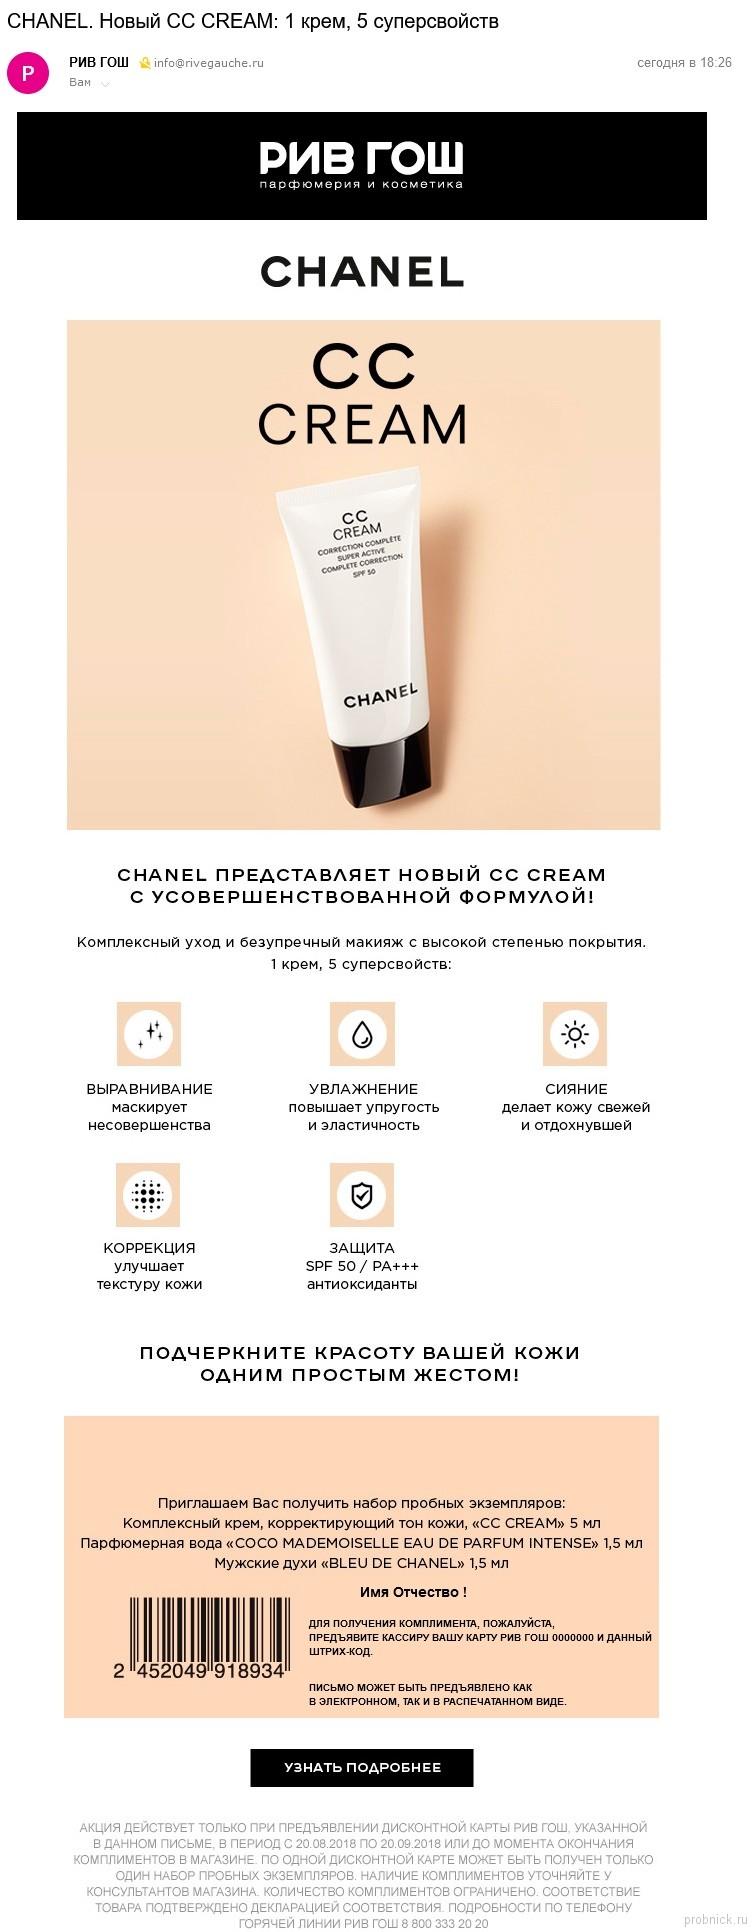 Chanel Рив Гош Интернет Магазин